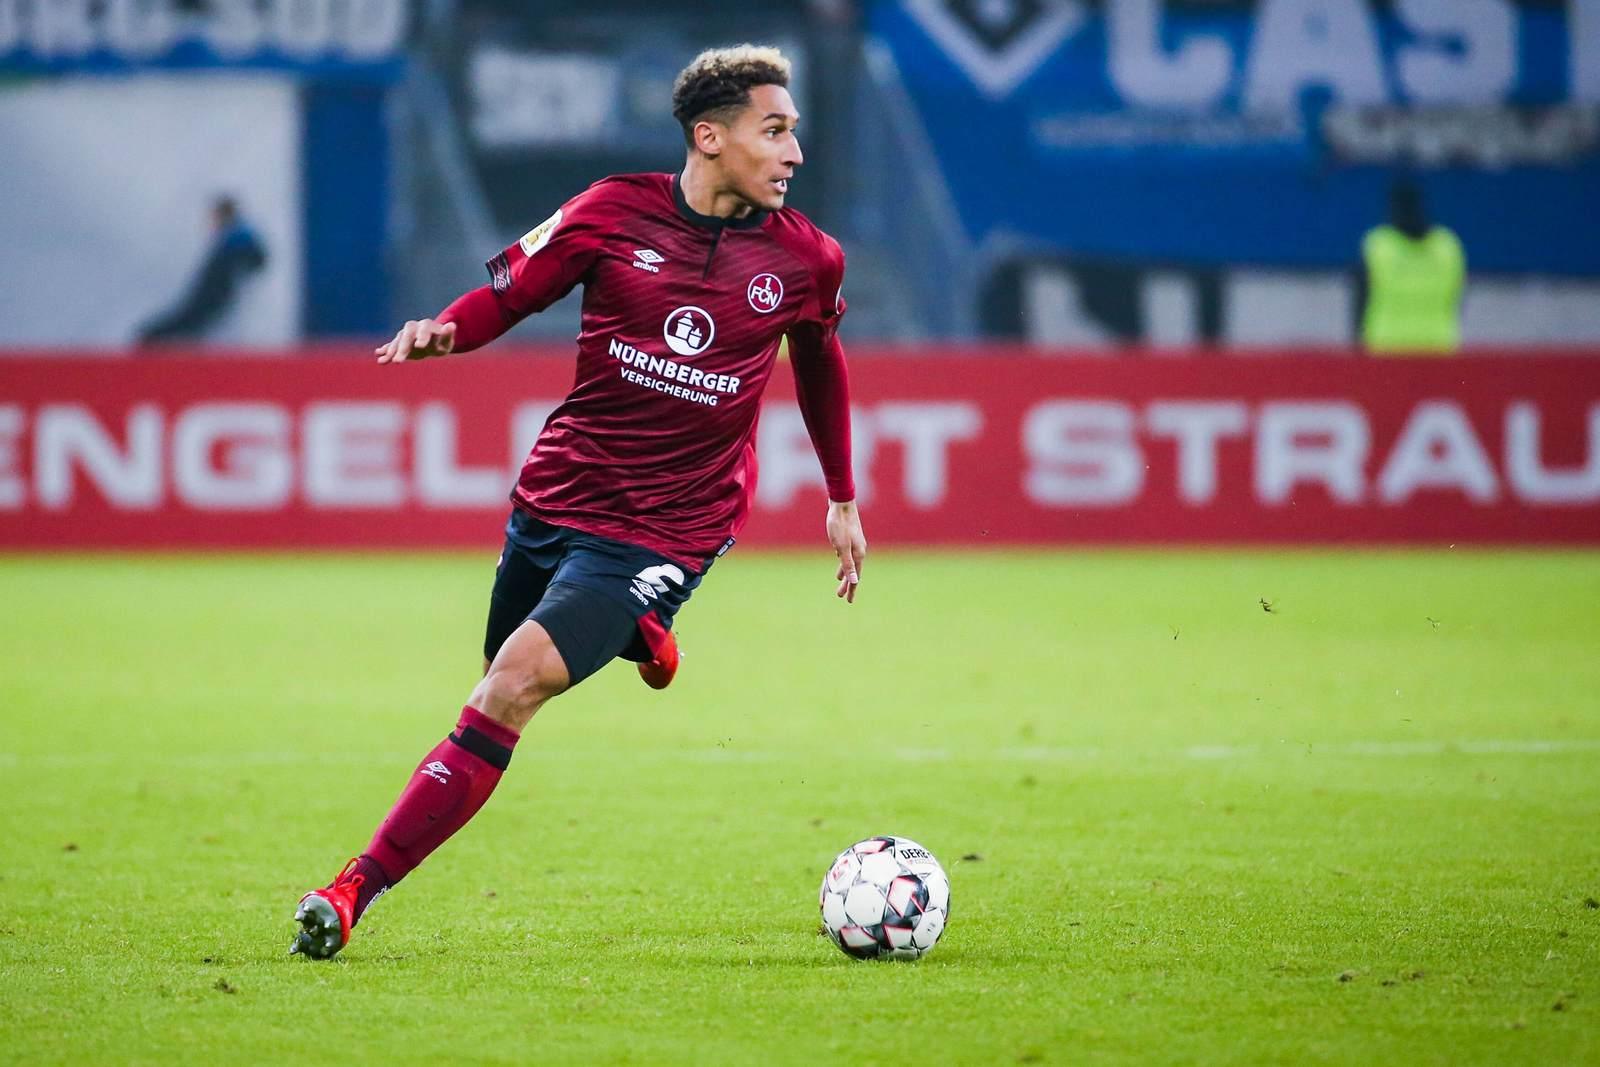 Kevin Goden am Ball für den 1. FC Nürnberg